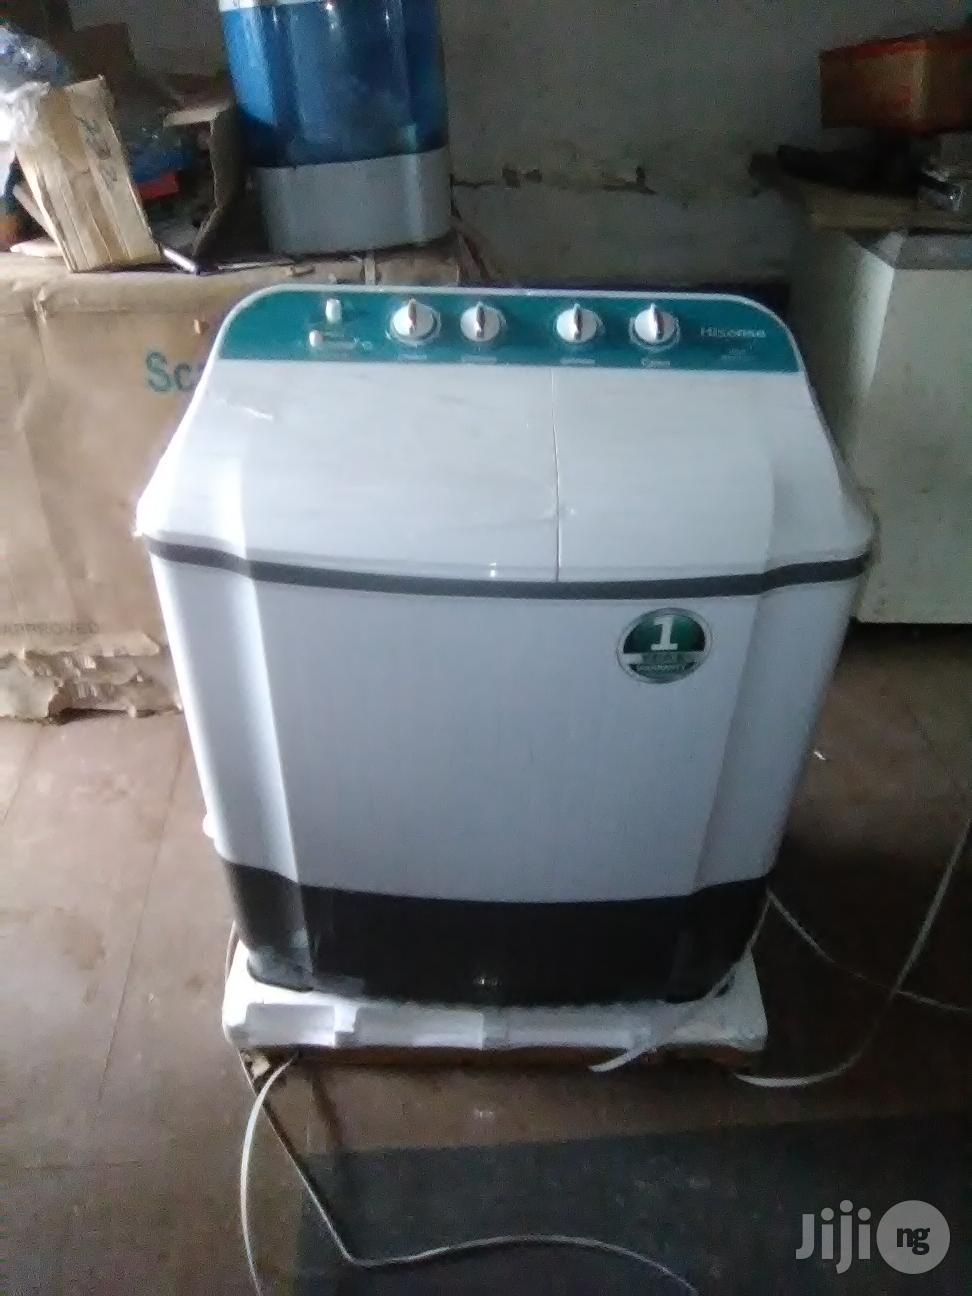 Hisense Washing Machime10kg